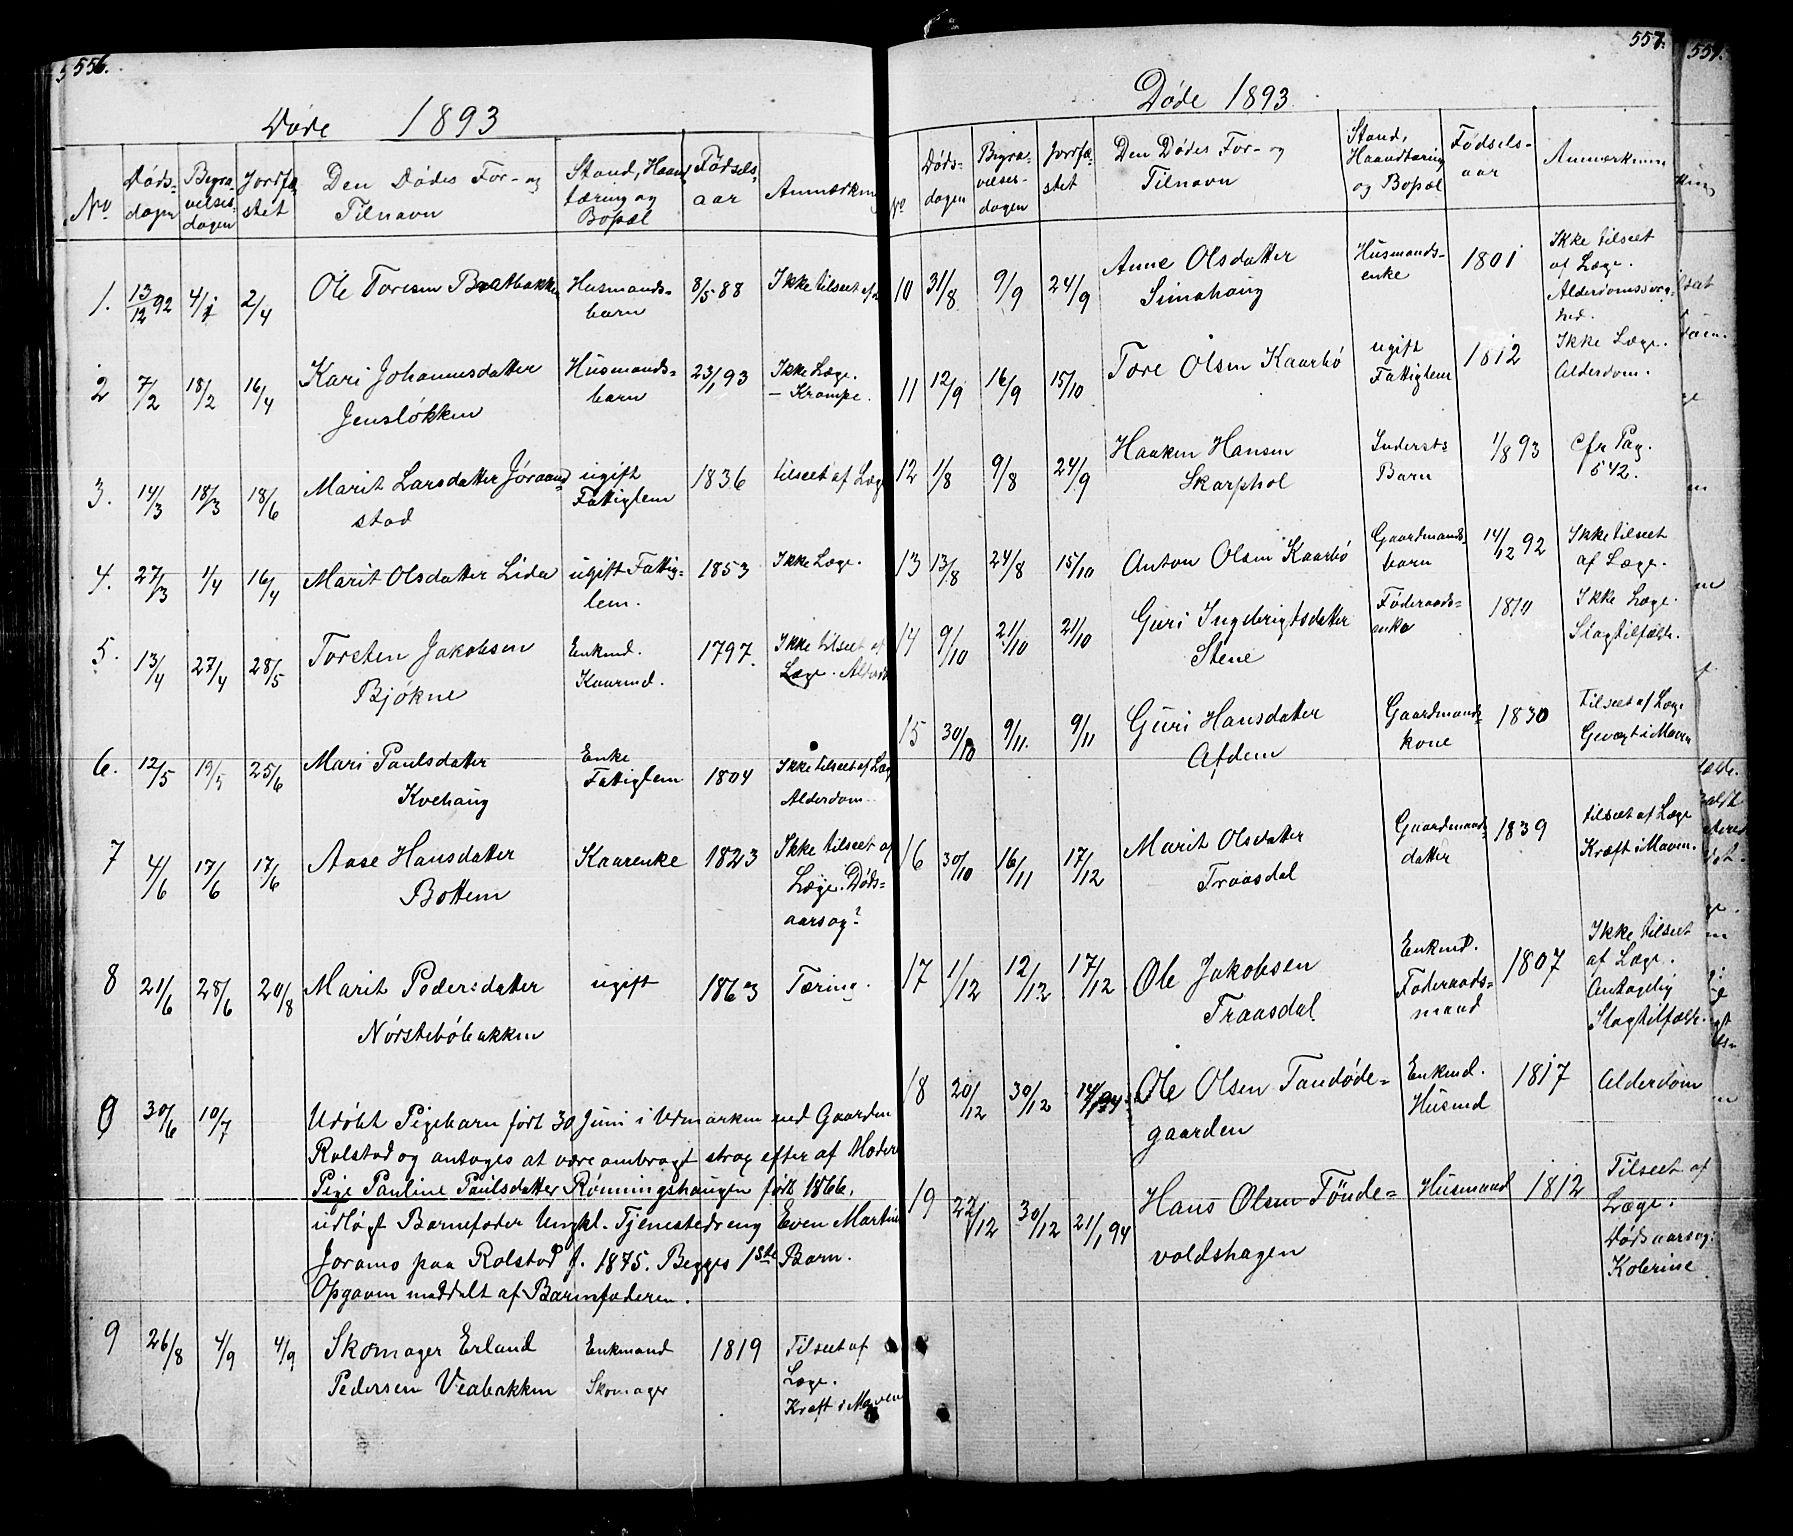 SAH, Lesja prestekontor, Klokkerbok nr. 5, 1850-1894, s. 556-557